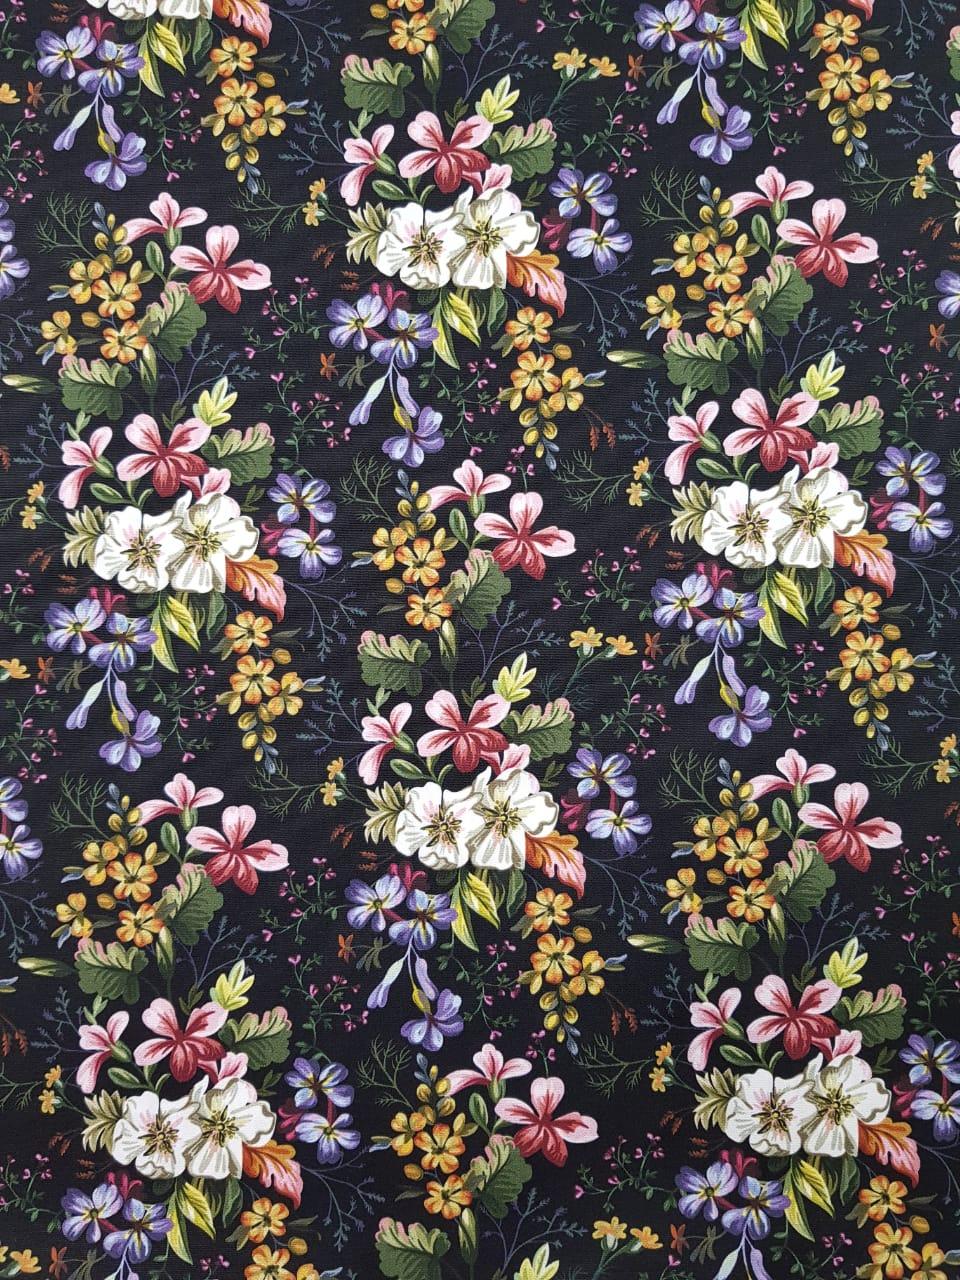 Digital - Floral romântico fundo preto / 0,25cm x 1,50m